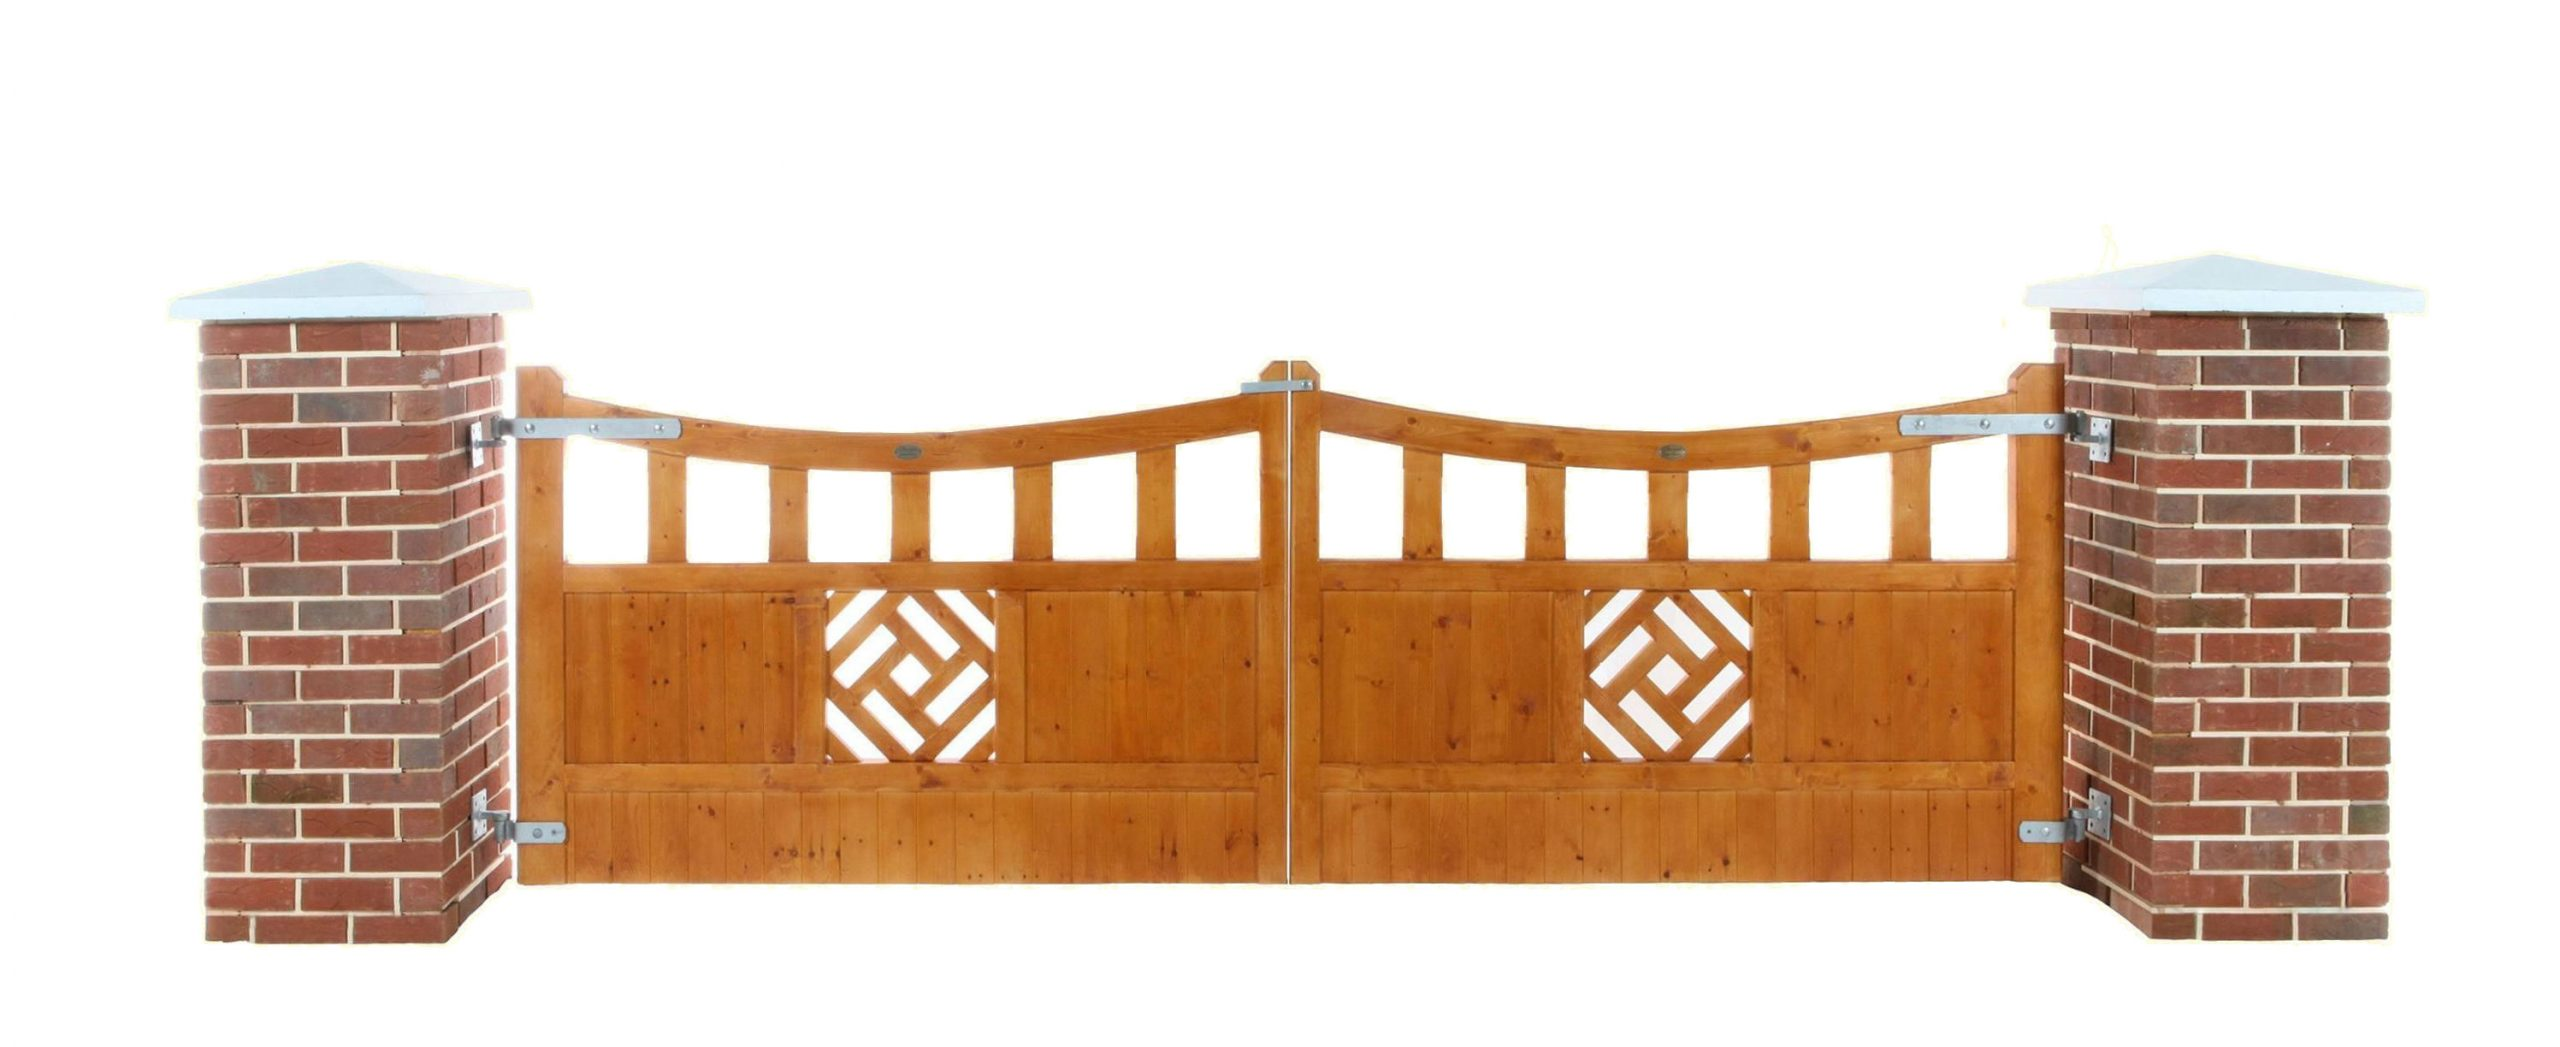 Waterford Gates